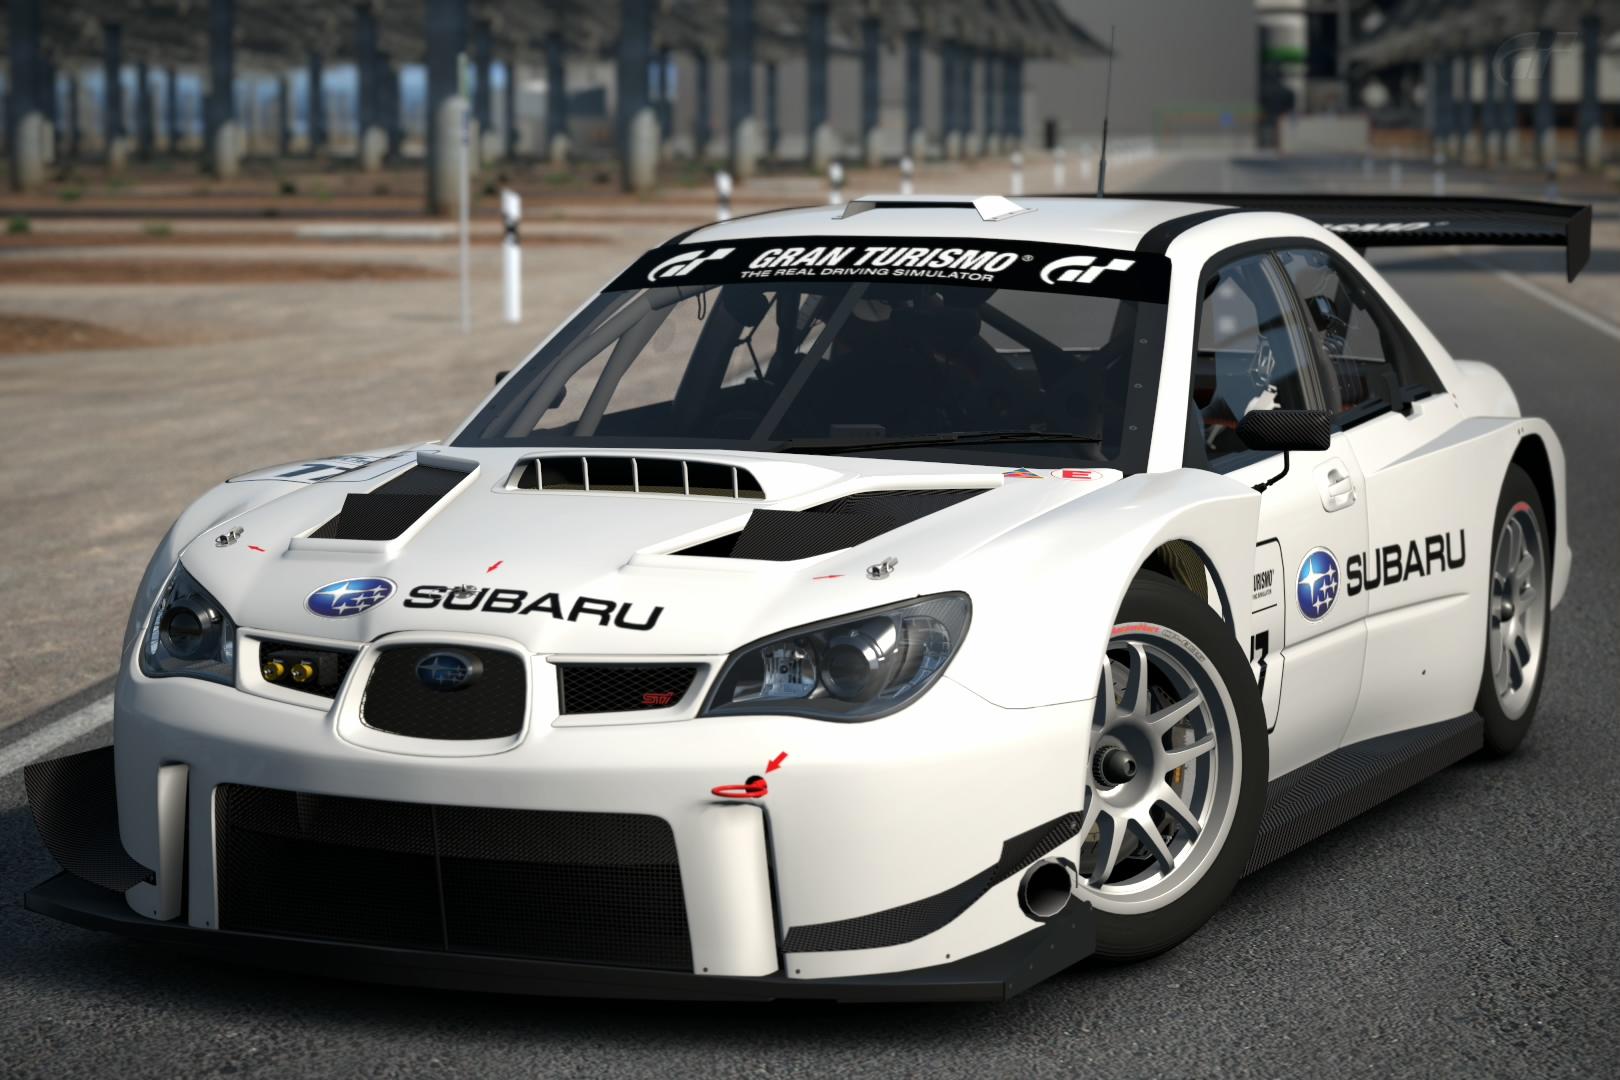 Subaru IMPREZA GT300 Base Model '08 | Gran Turismo Wiki ...